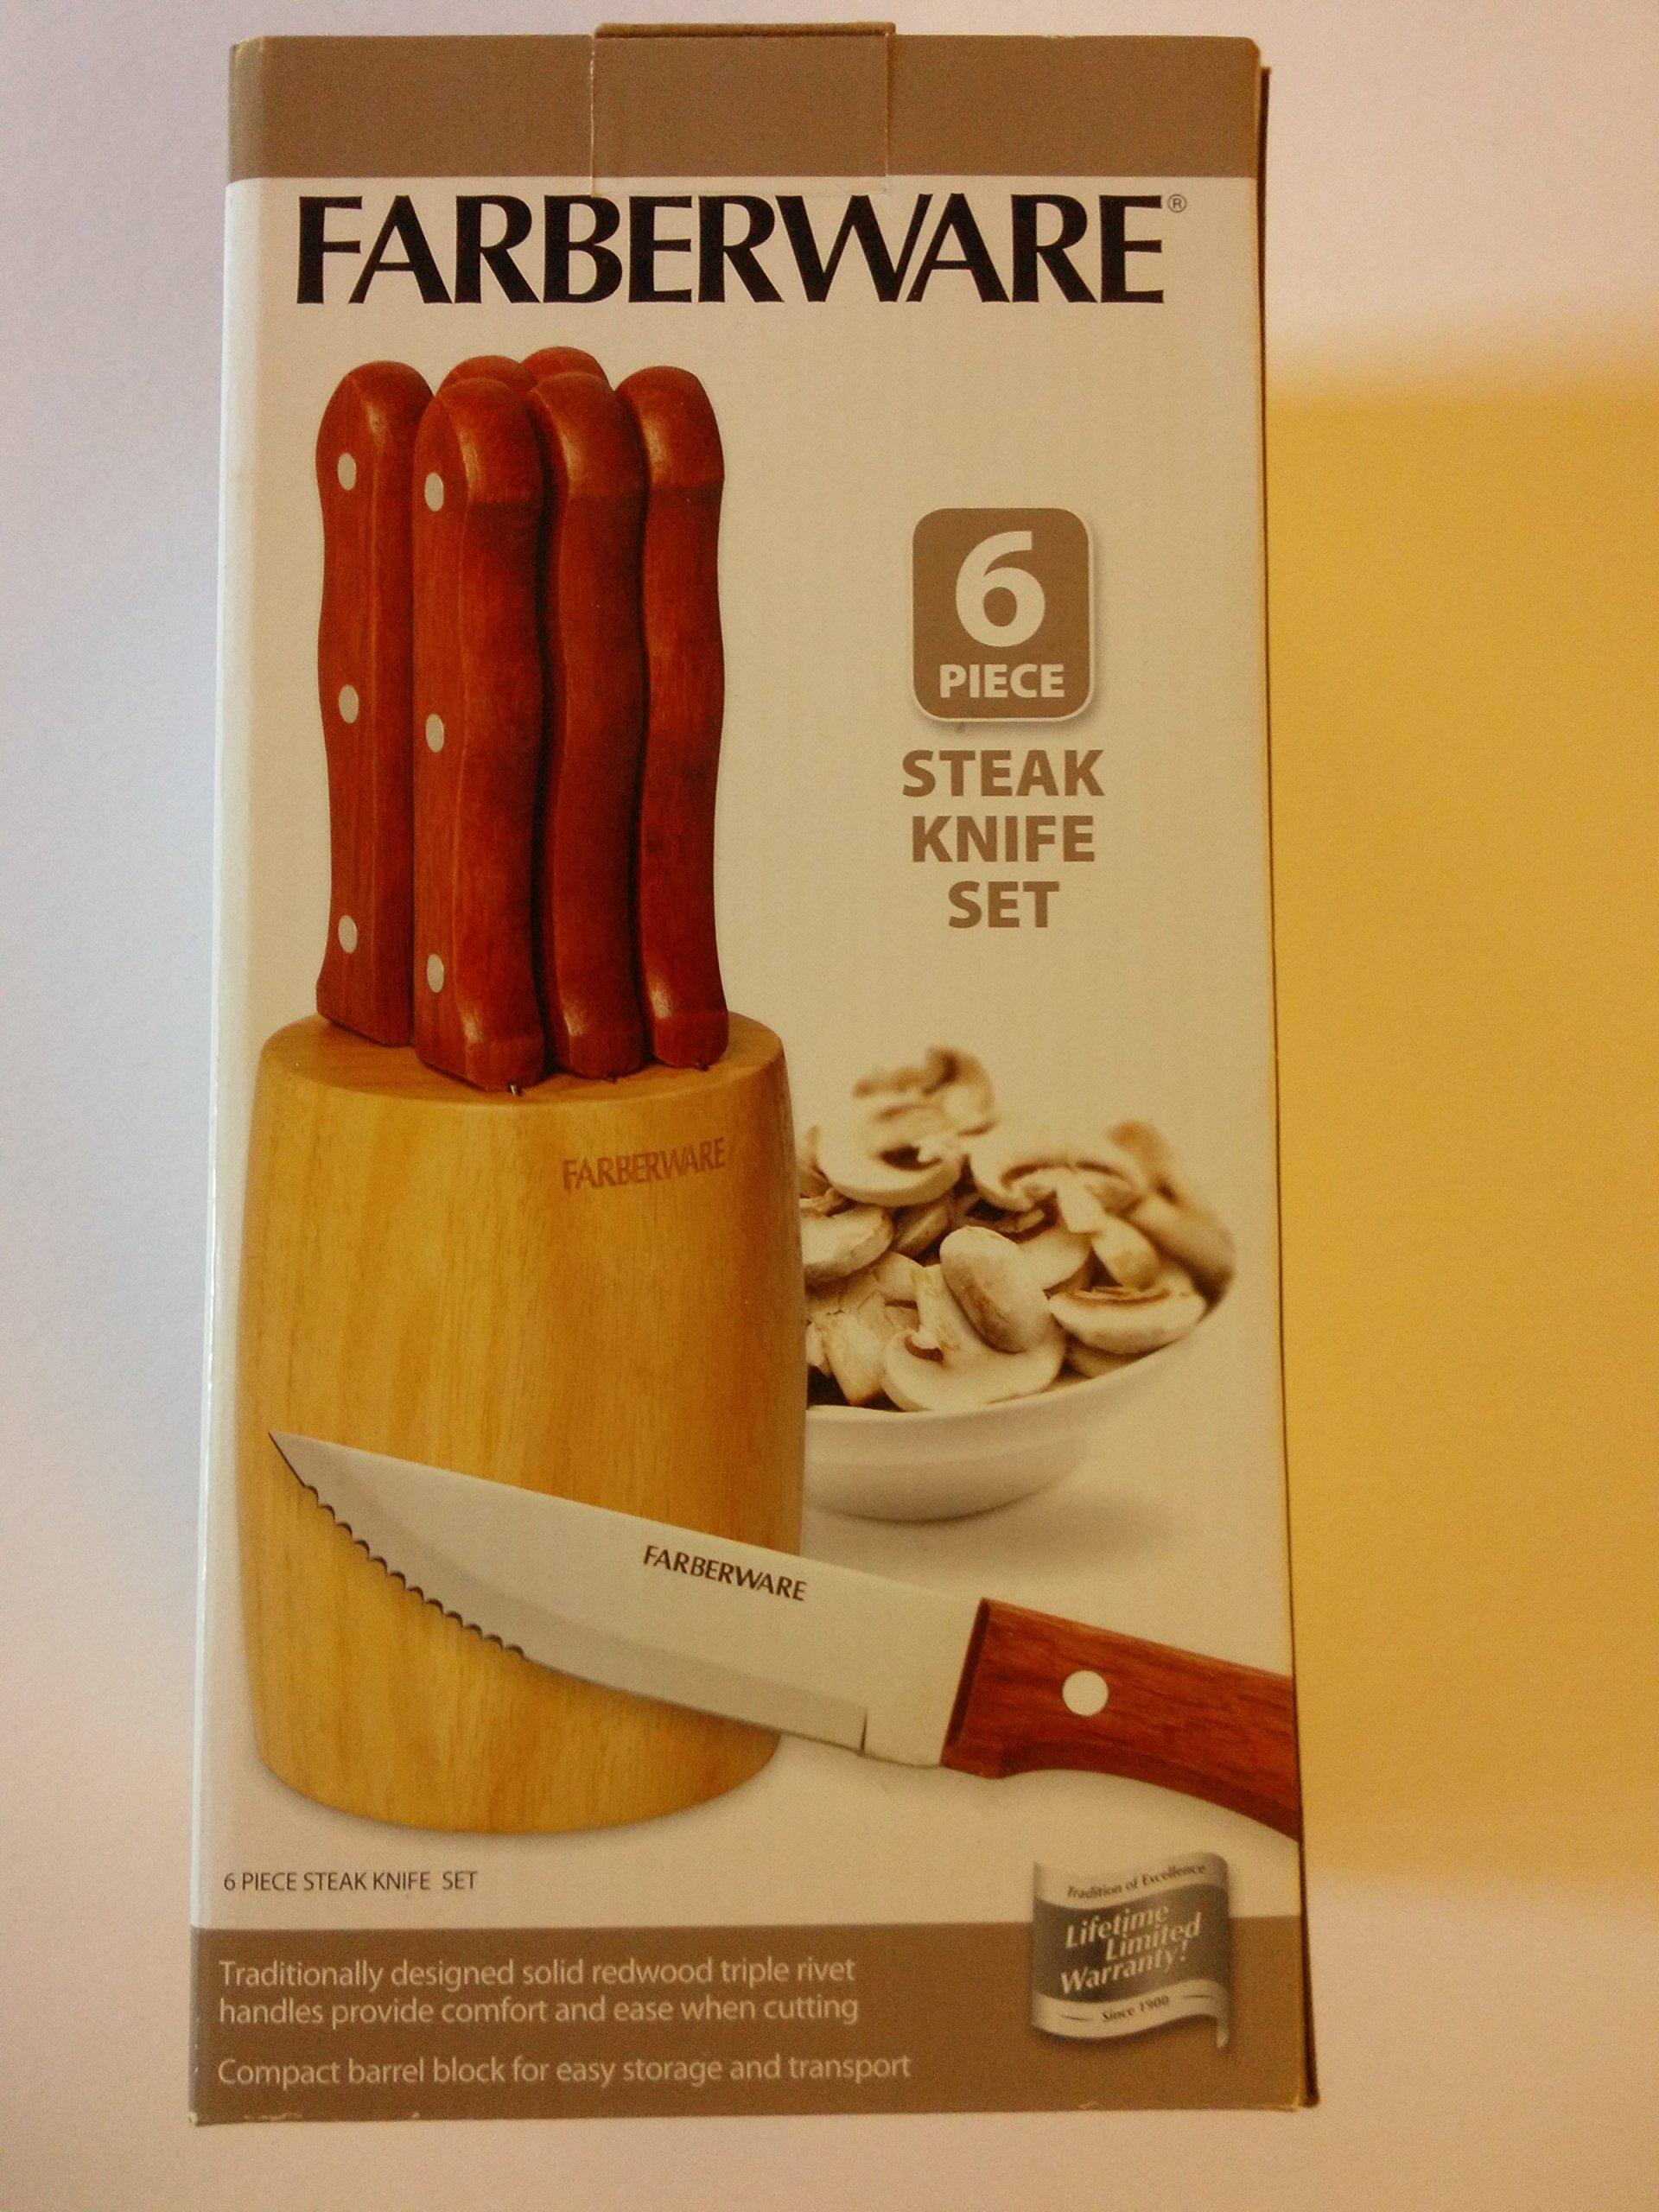 Farberware 6 Piece Steak Knife Set